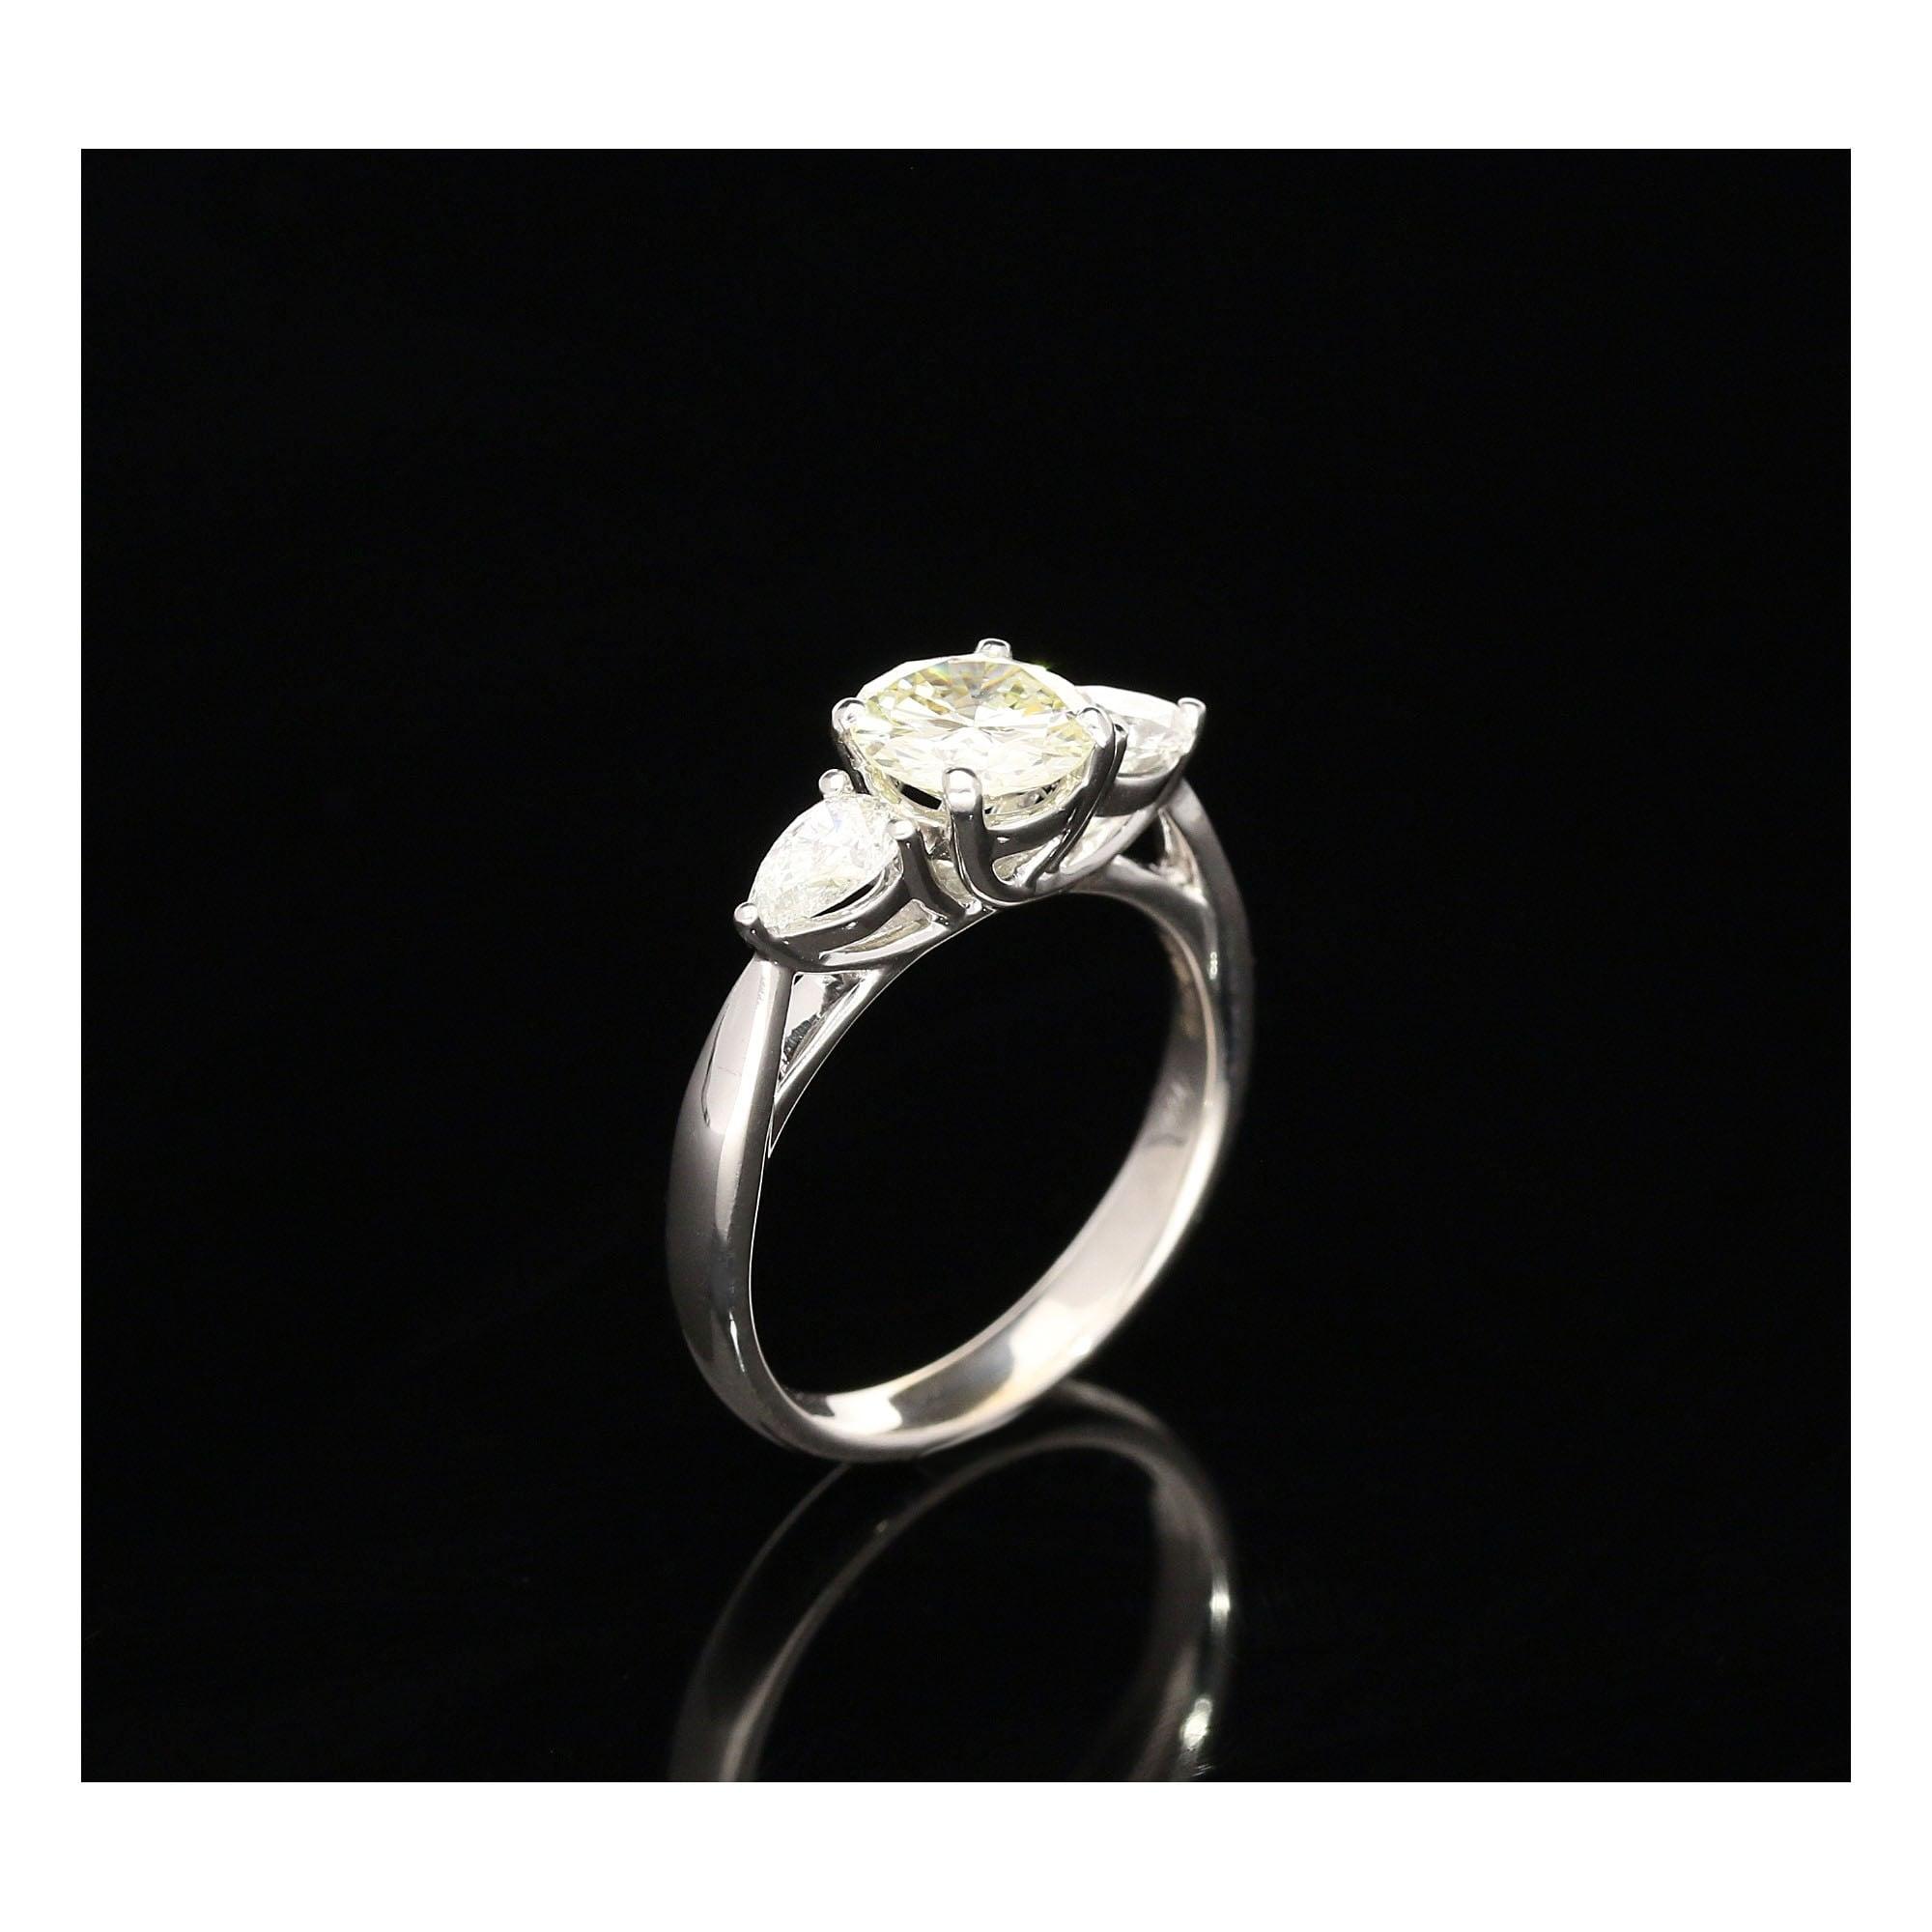 milton s secondhand 18ct white gold 3 ring